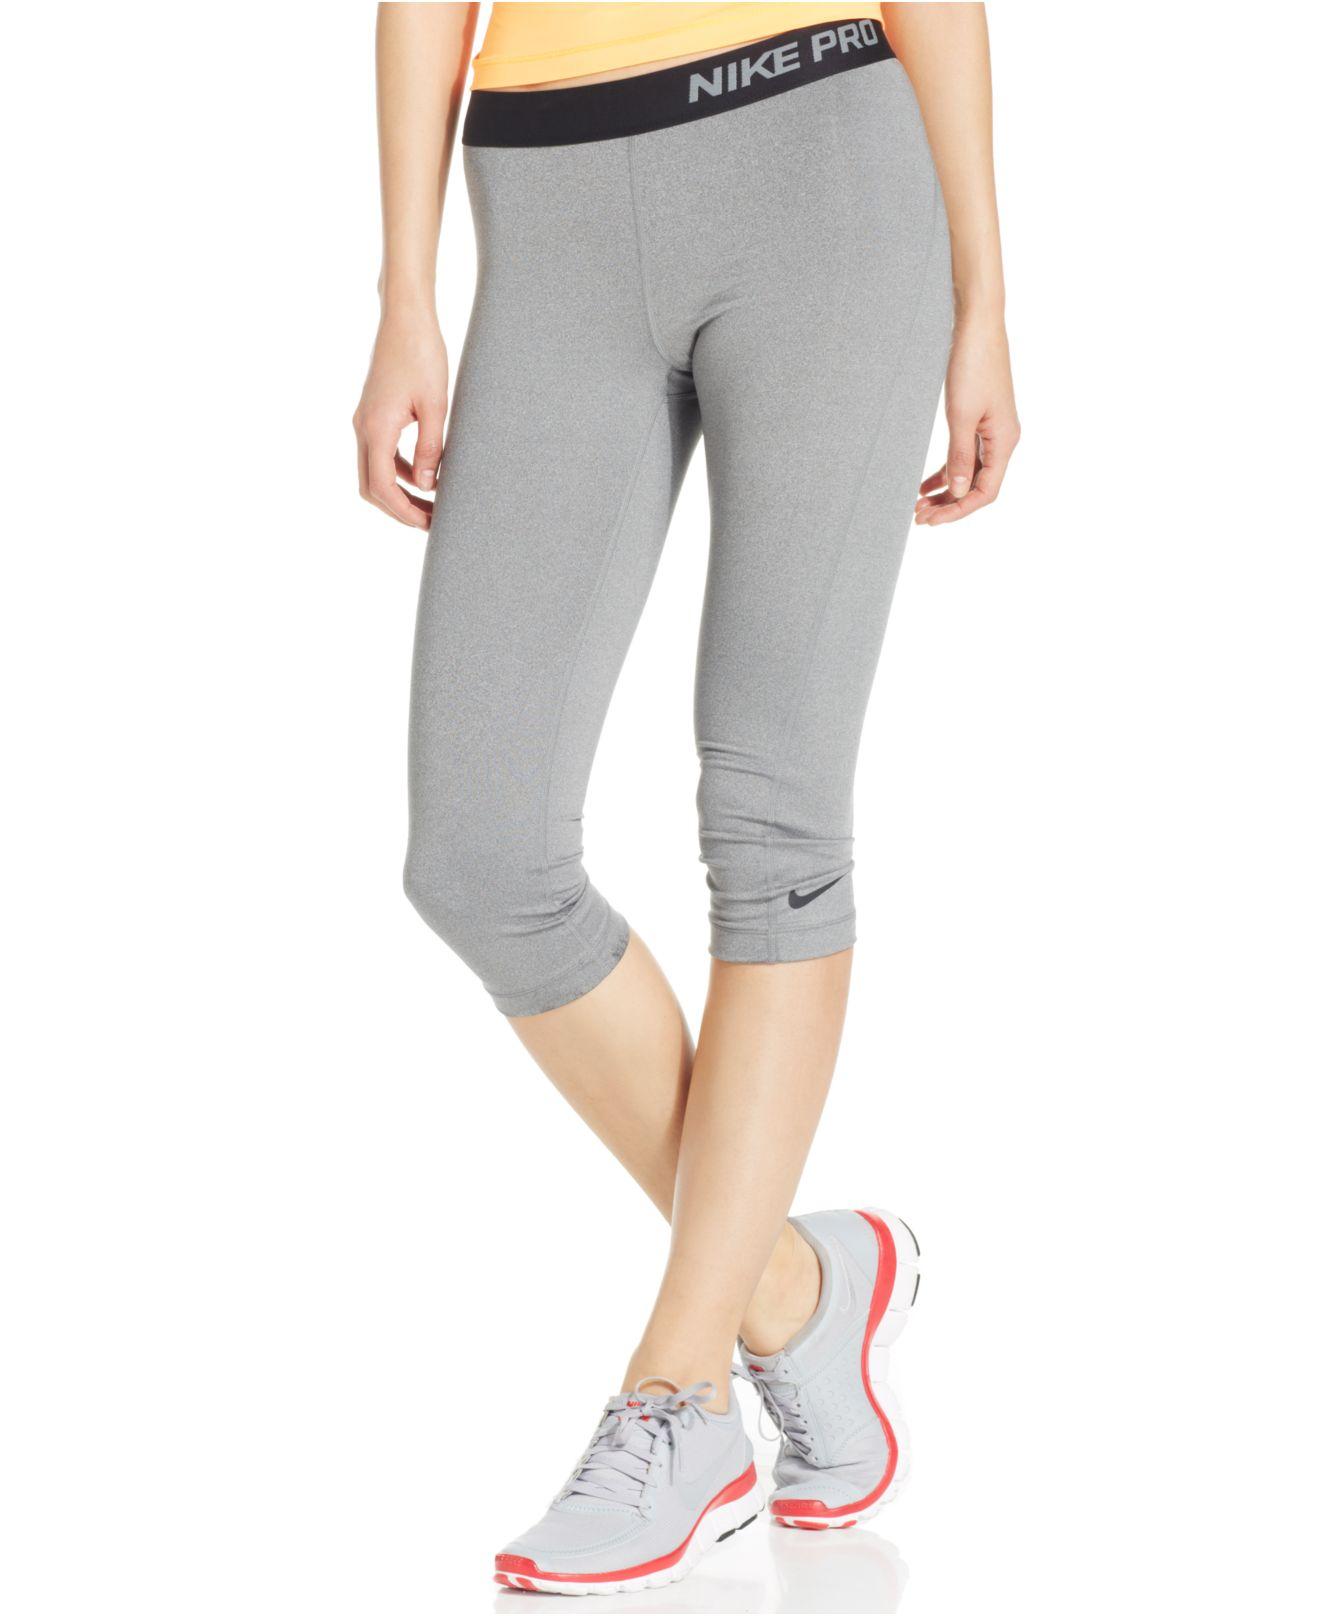 4e838c92eb0e4 Nike Pro Capri Active Leggings in Gray - Lyst